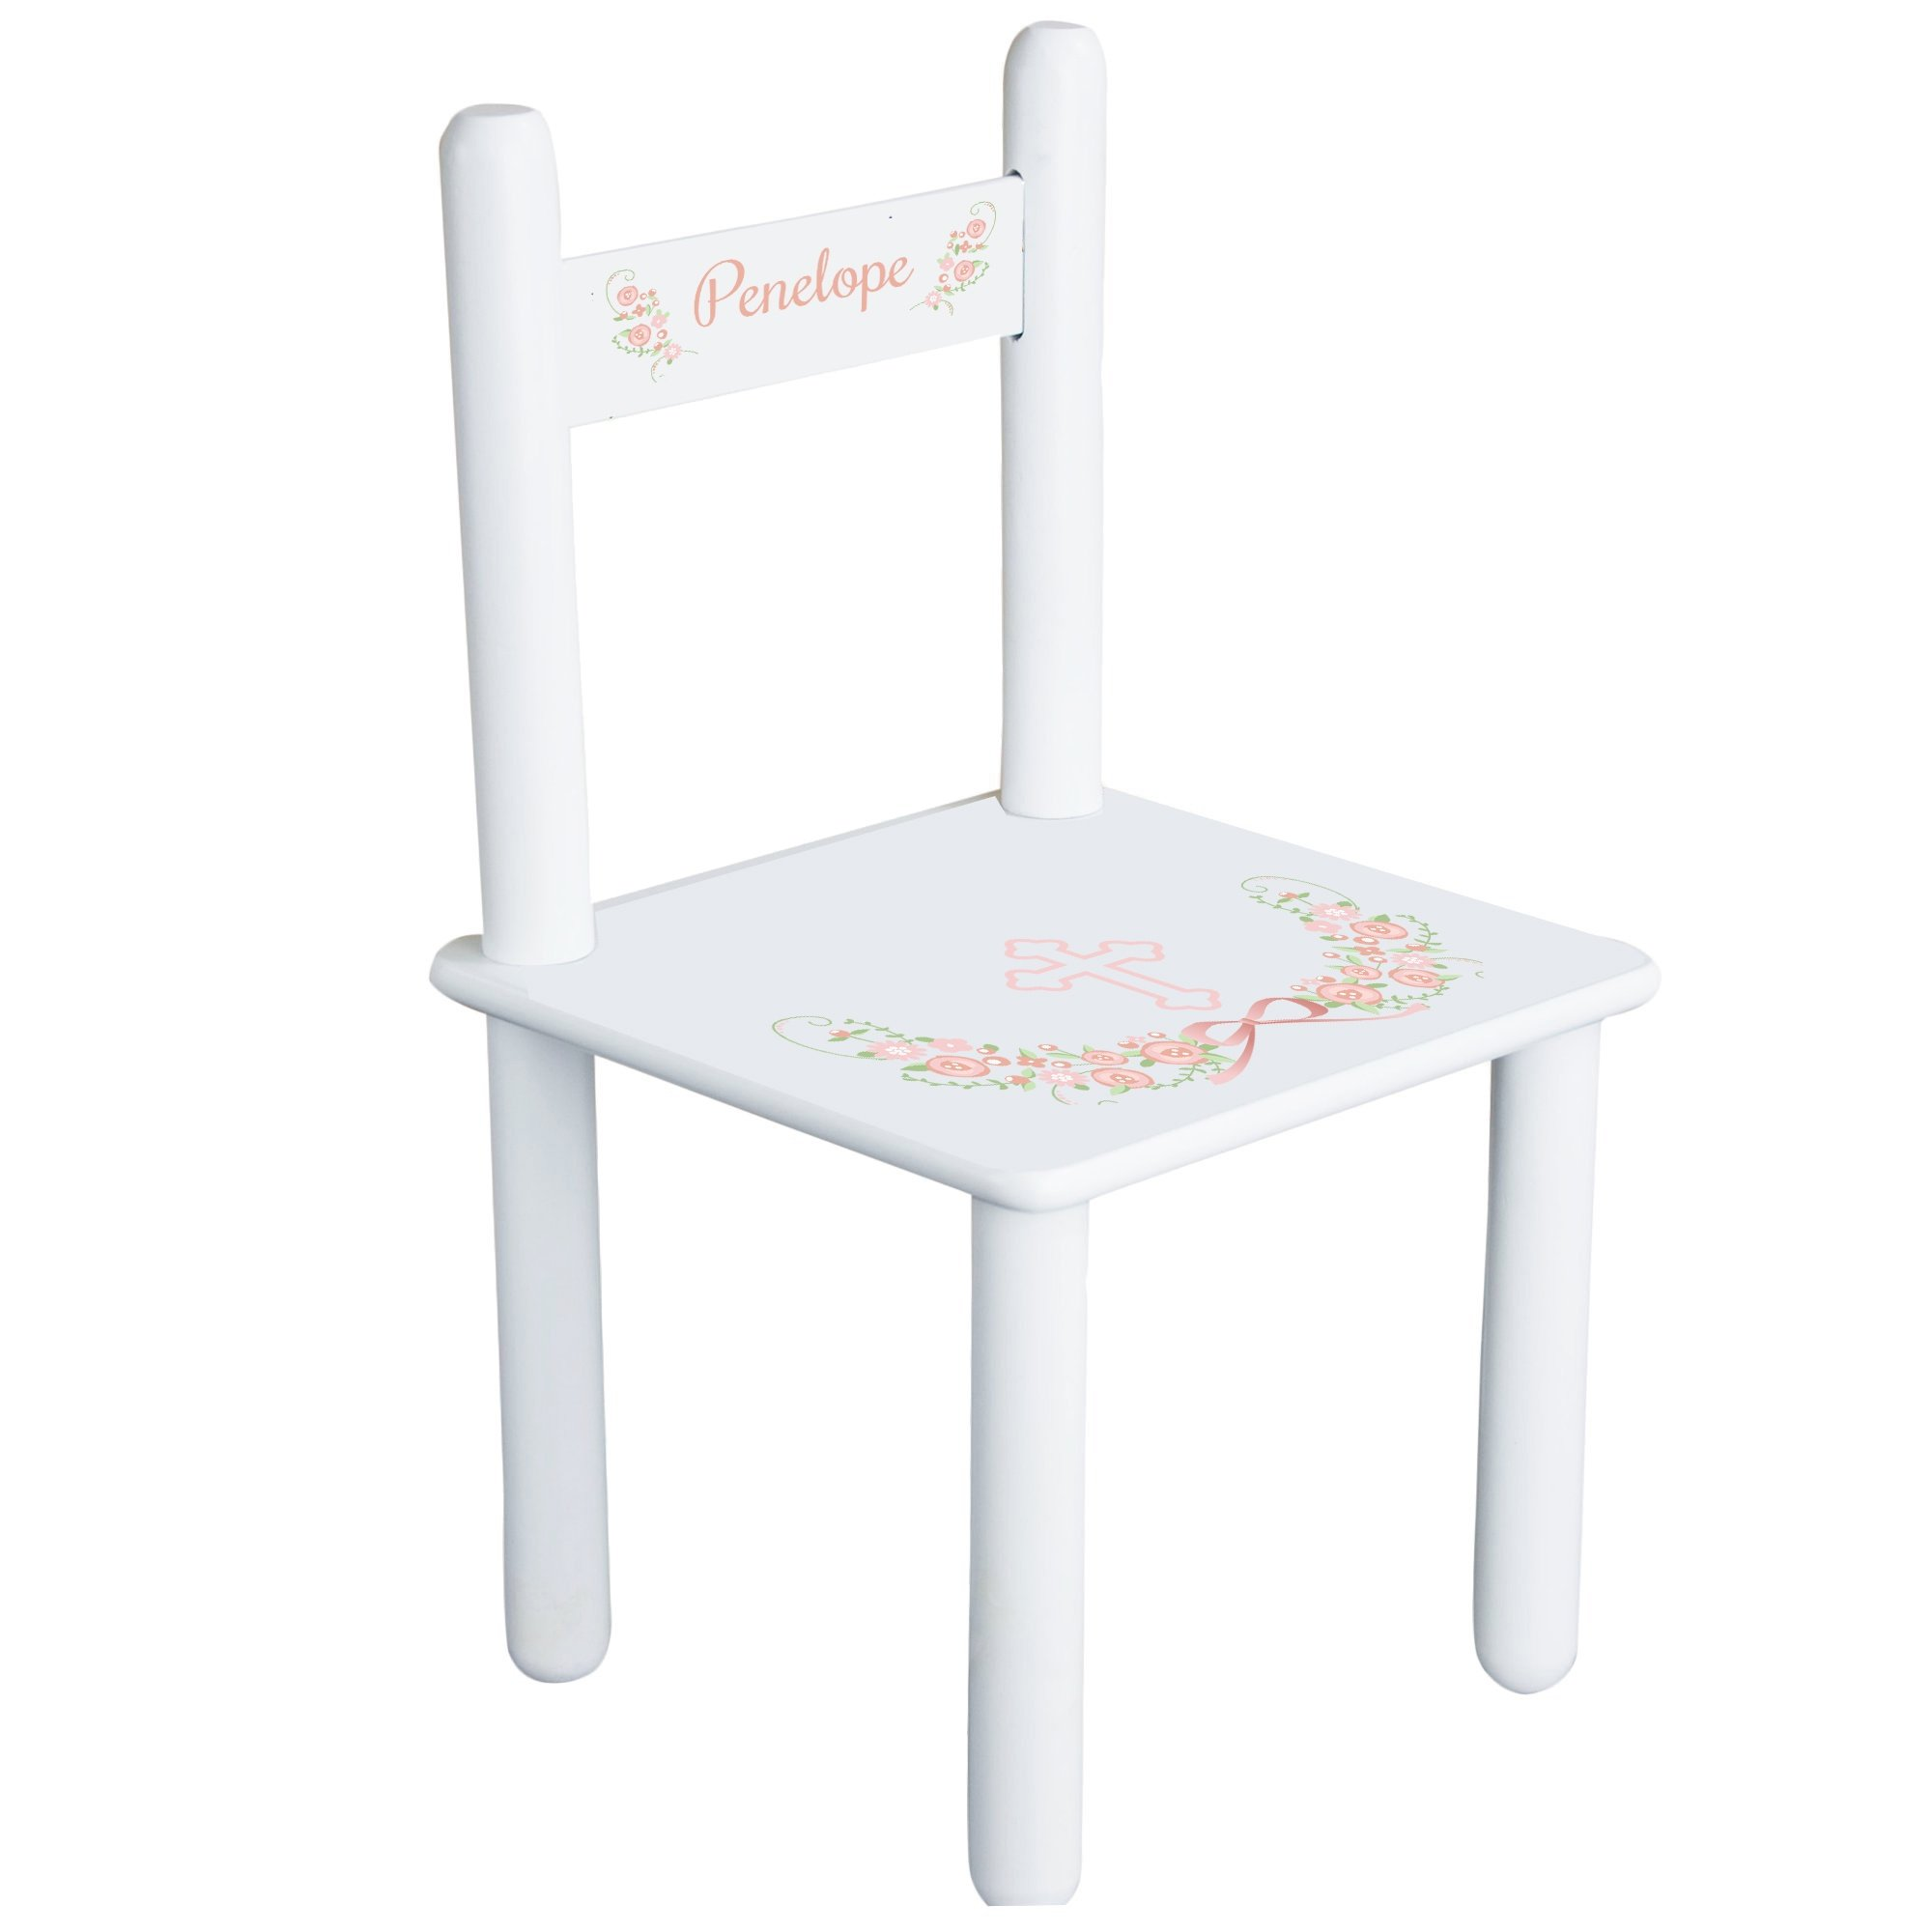 MyBambino Personalized Blush Baptism Theme Childrens Chair